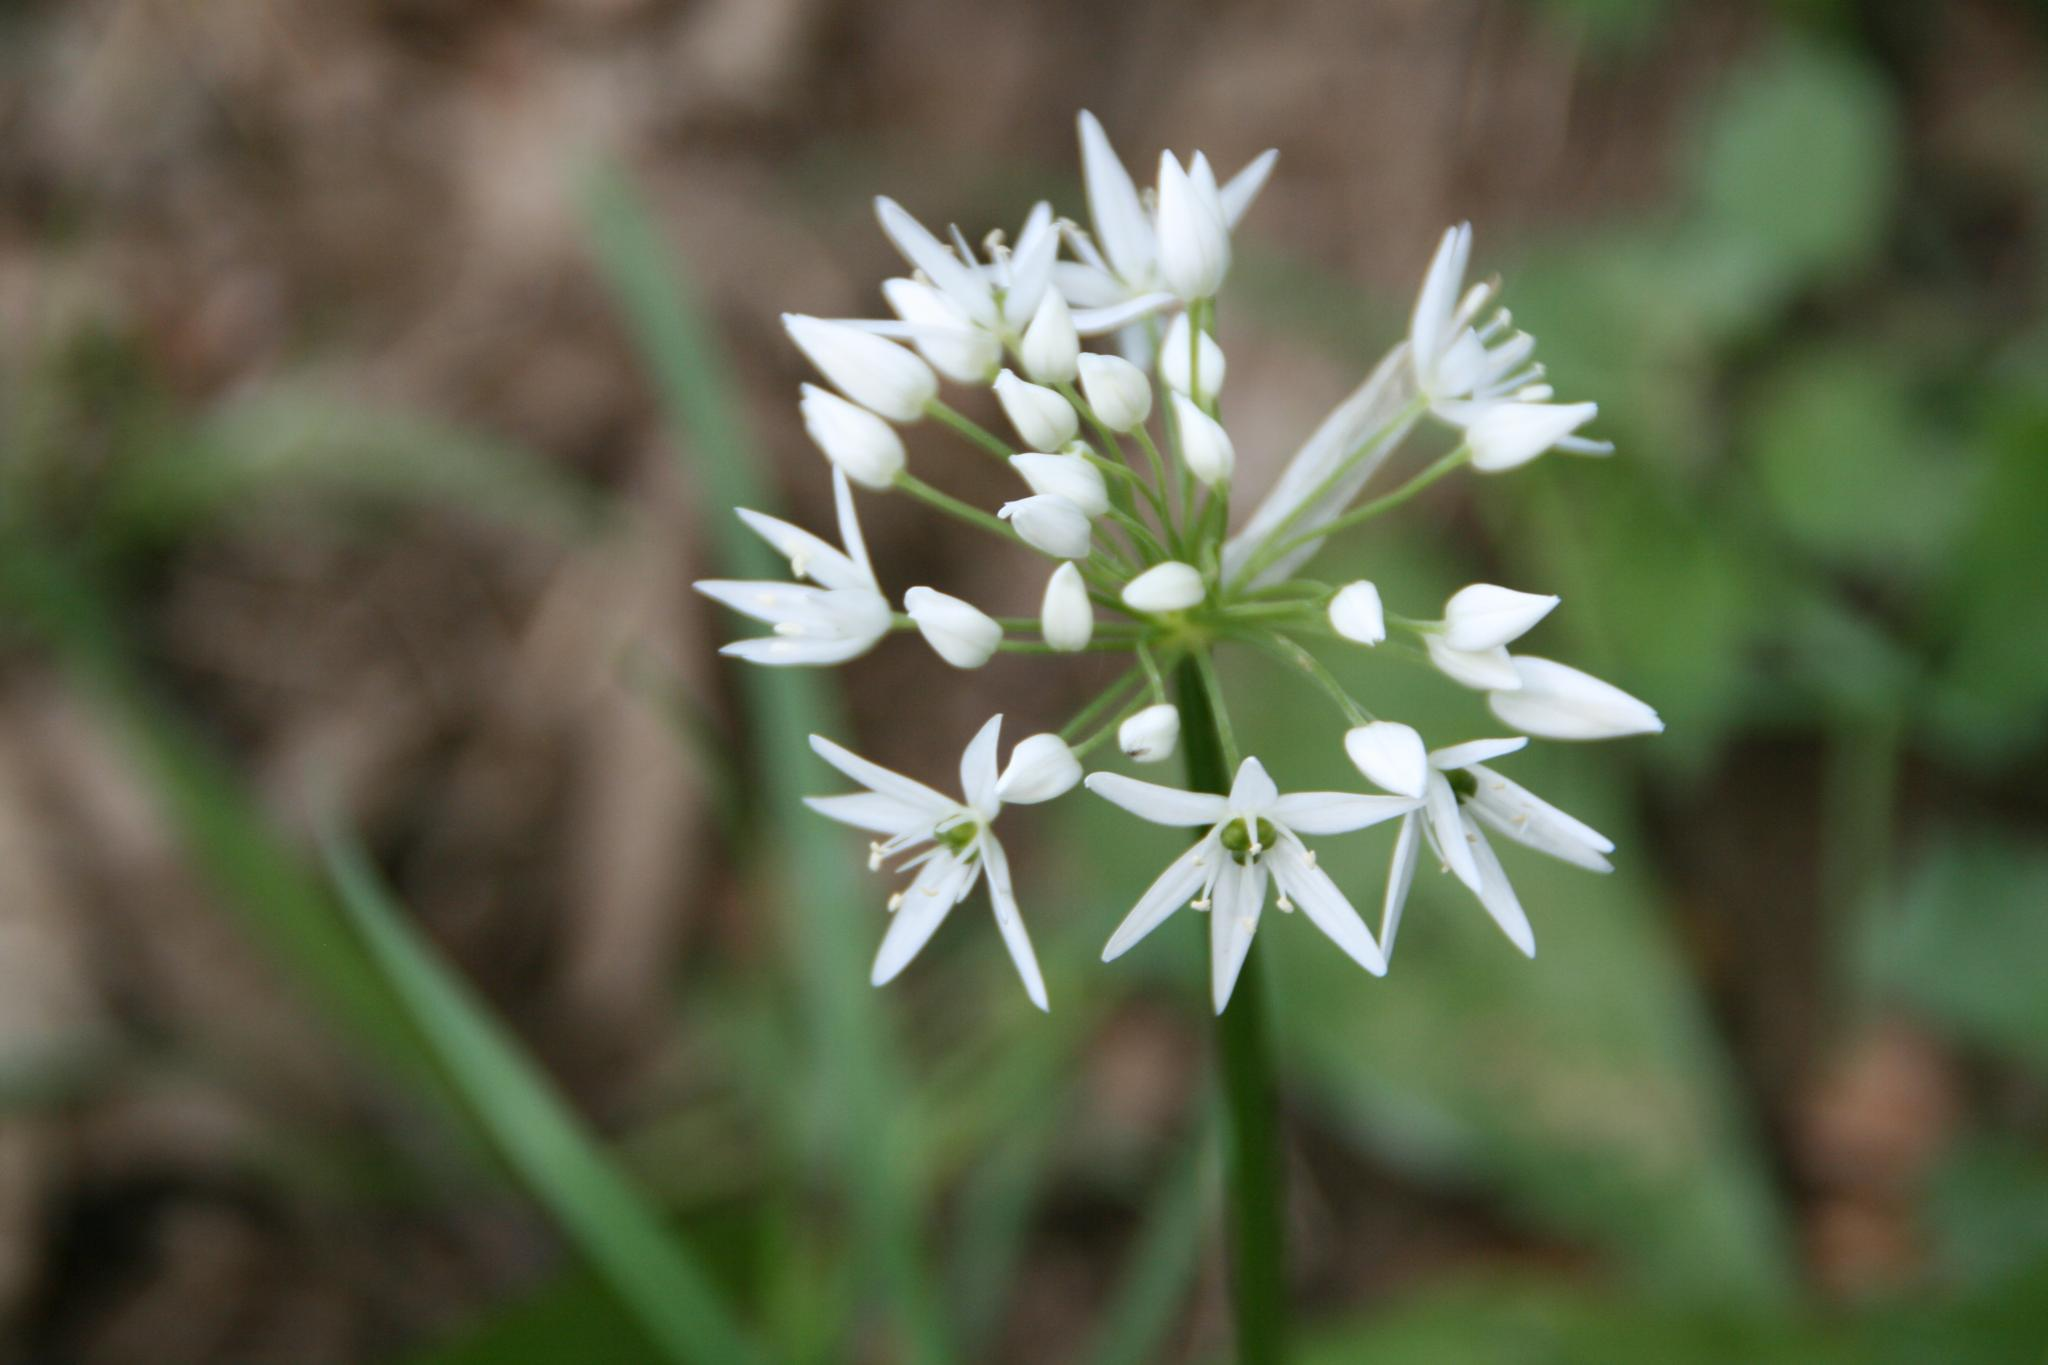 flower by helen.vandenbroek.9